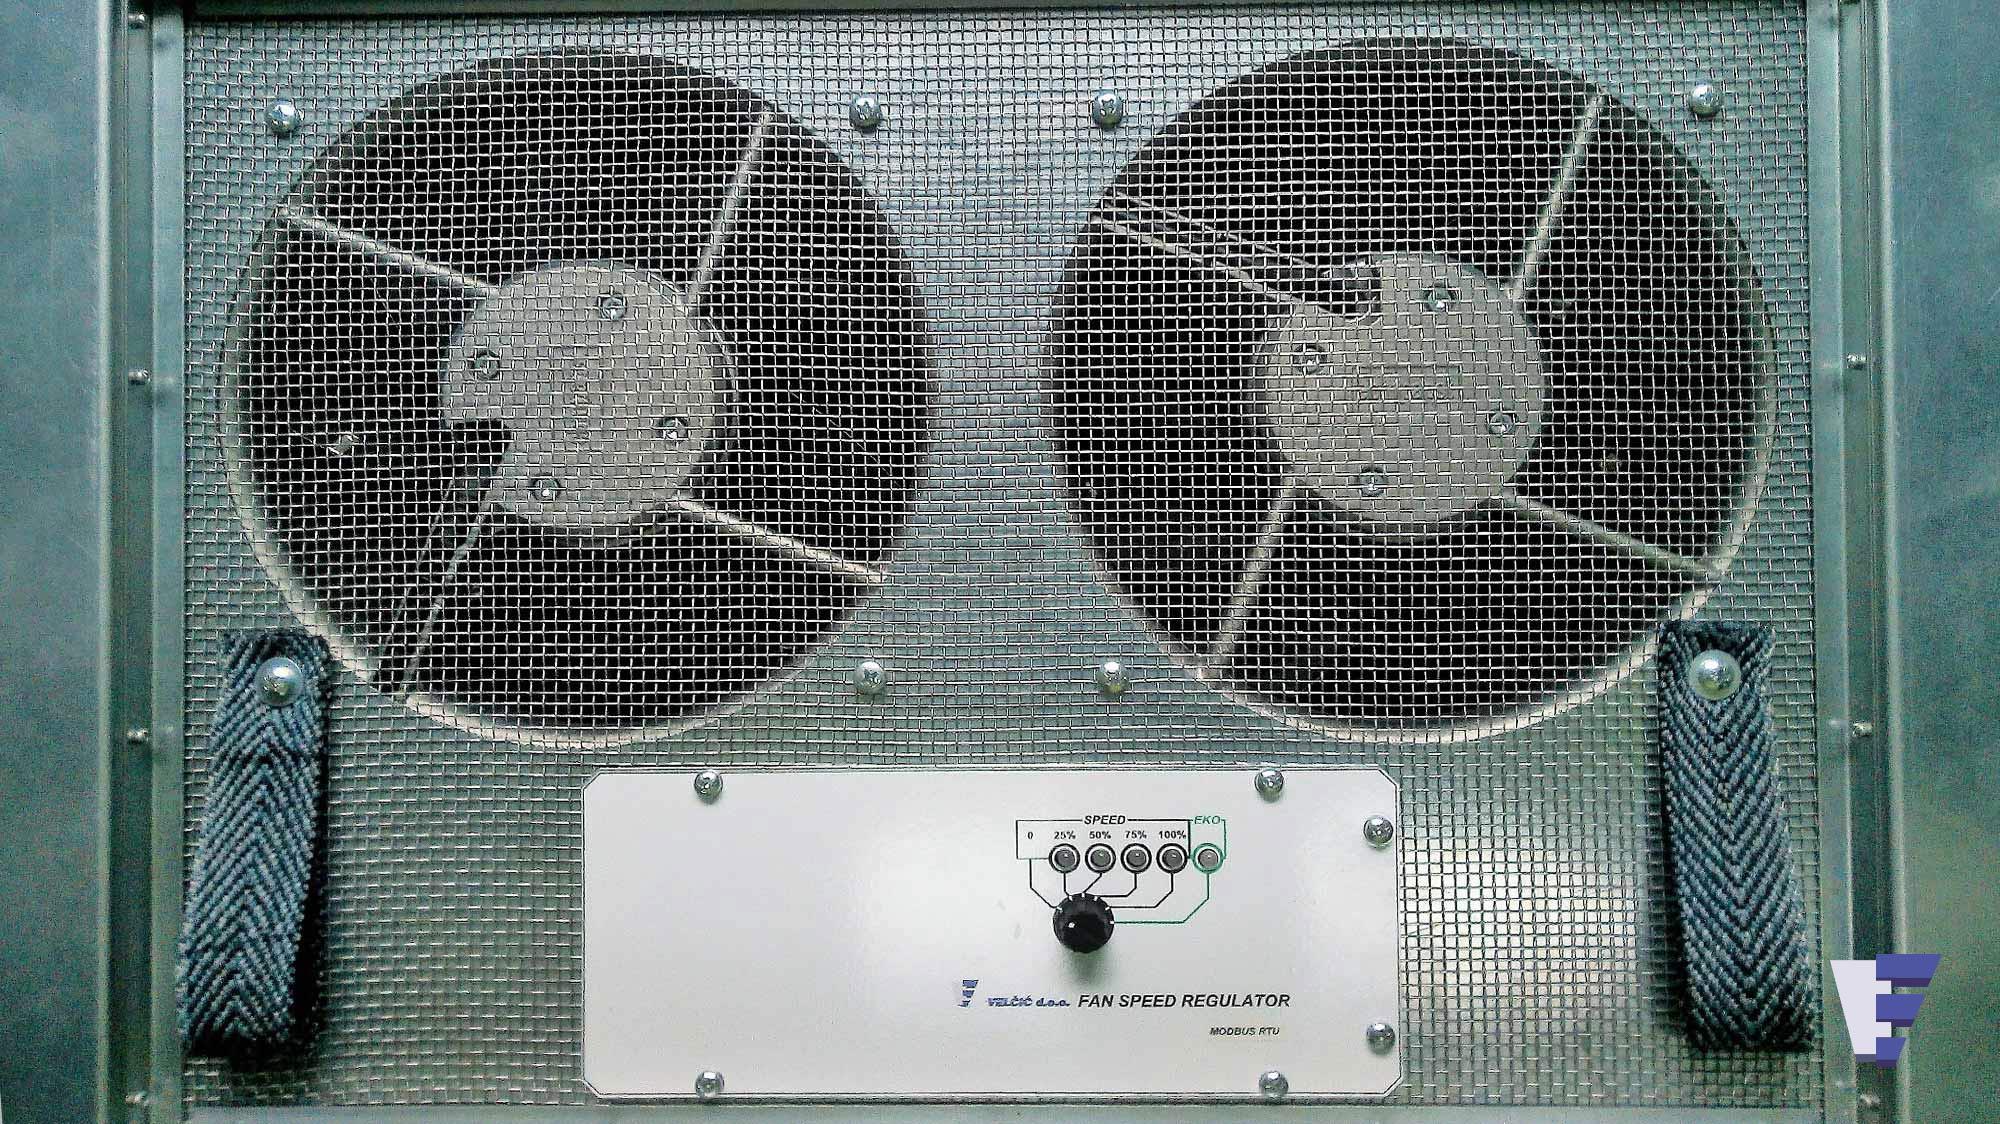 Velčić Ltd - Floor fan unit - increased ventilation